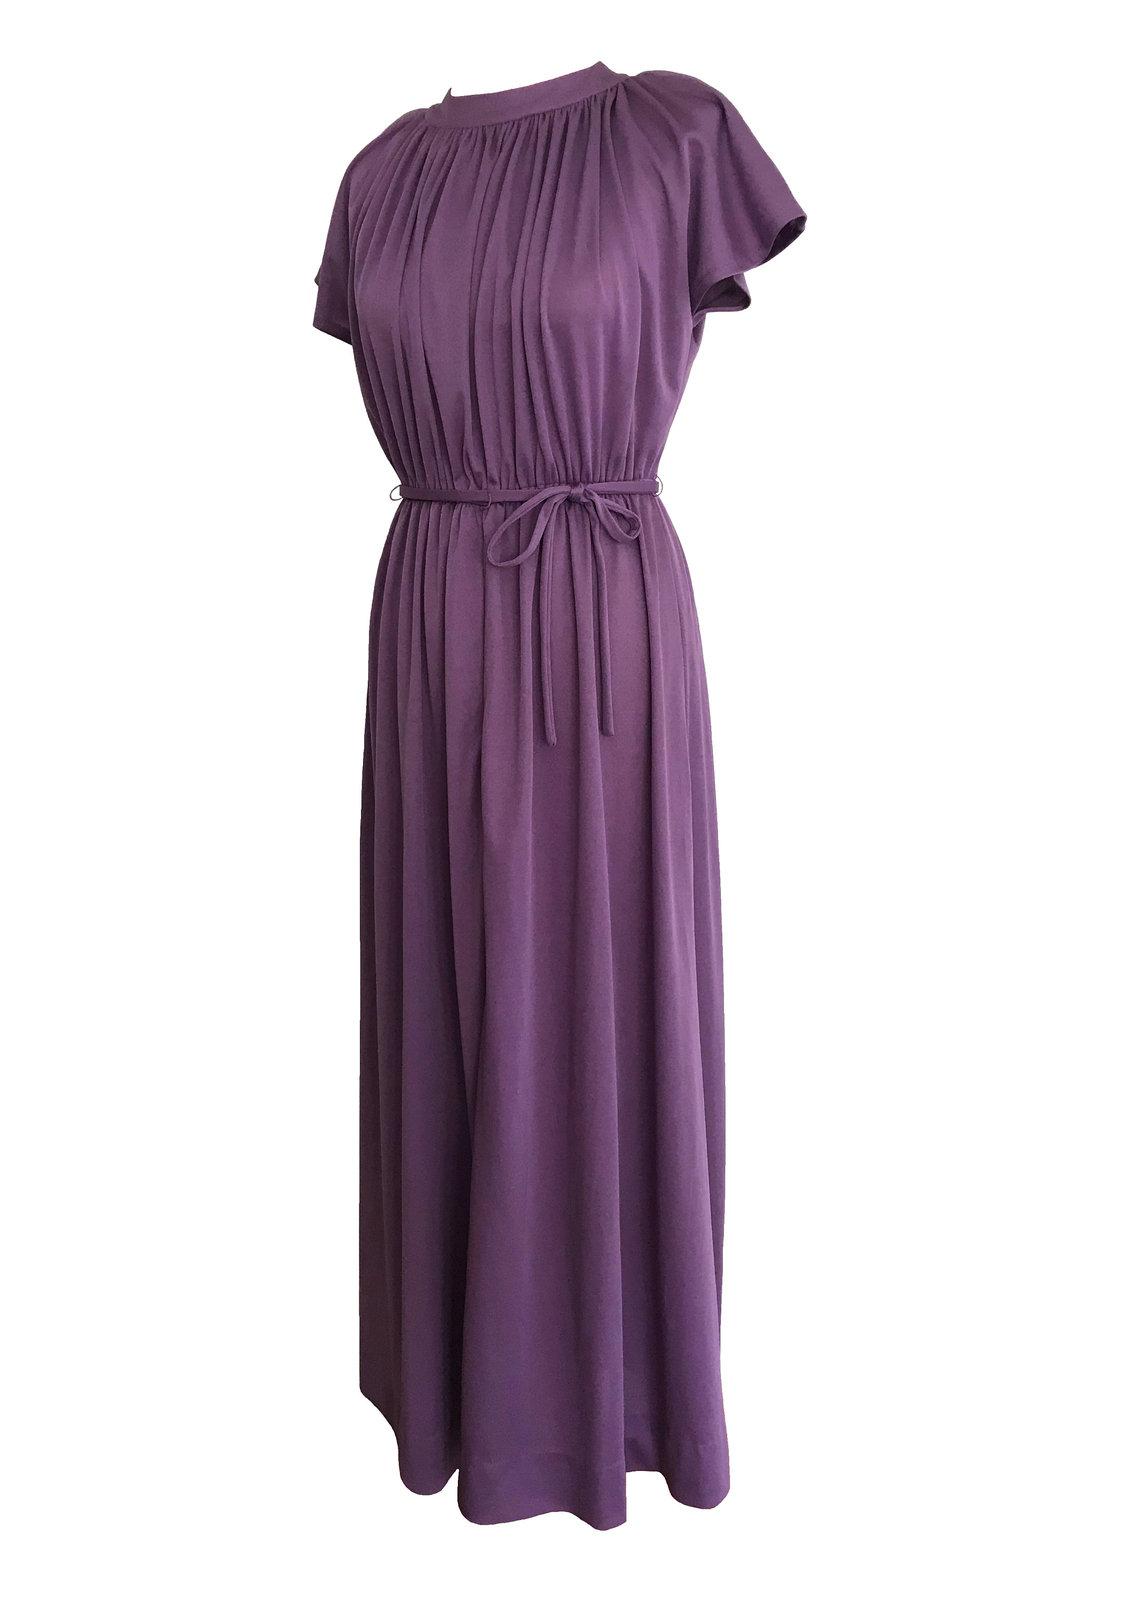 70s Lavender Plum Heather Grecian Style Ruched Draped Tunic Raglan Kimono Sleeve image 6